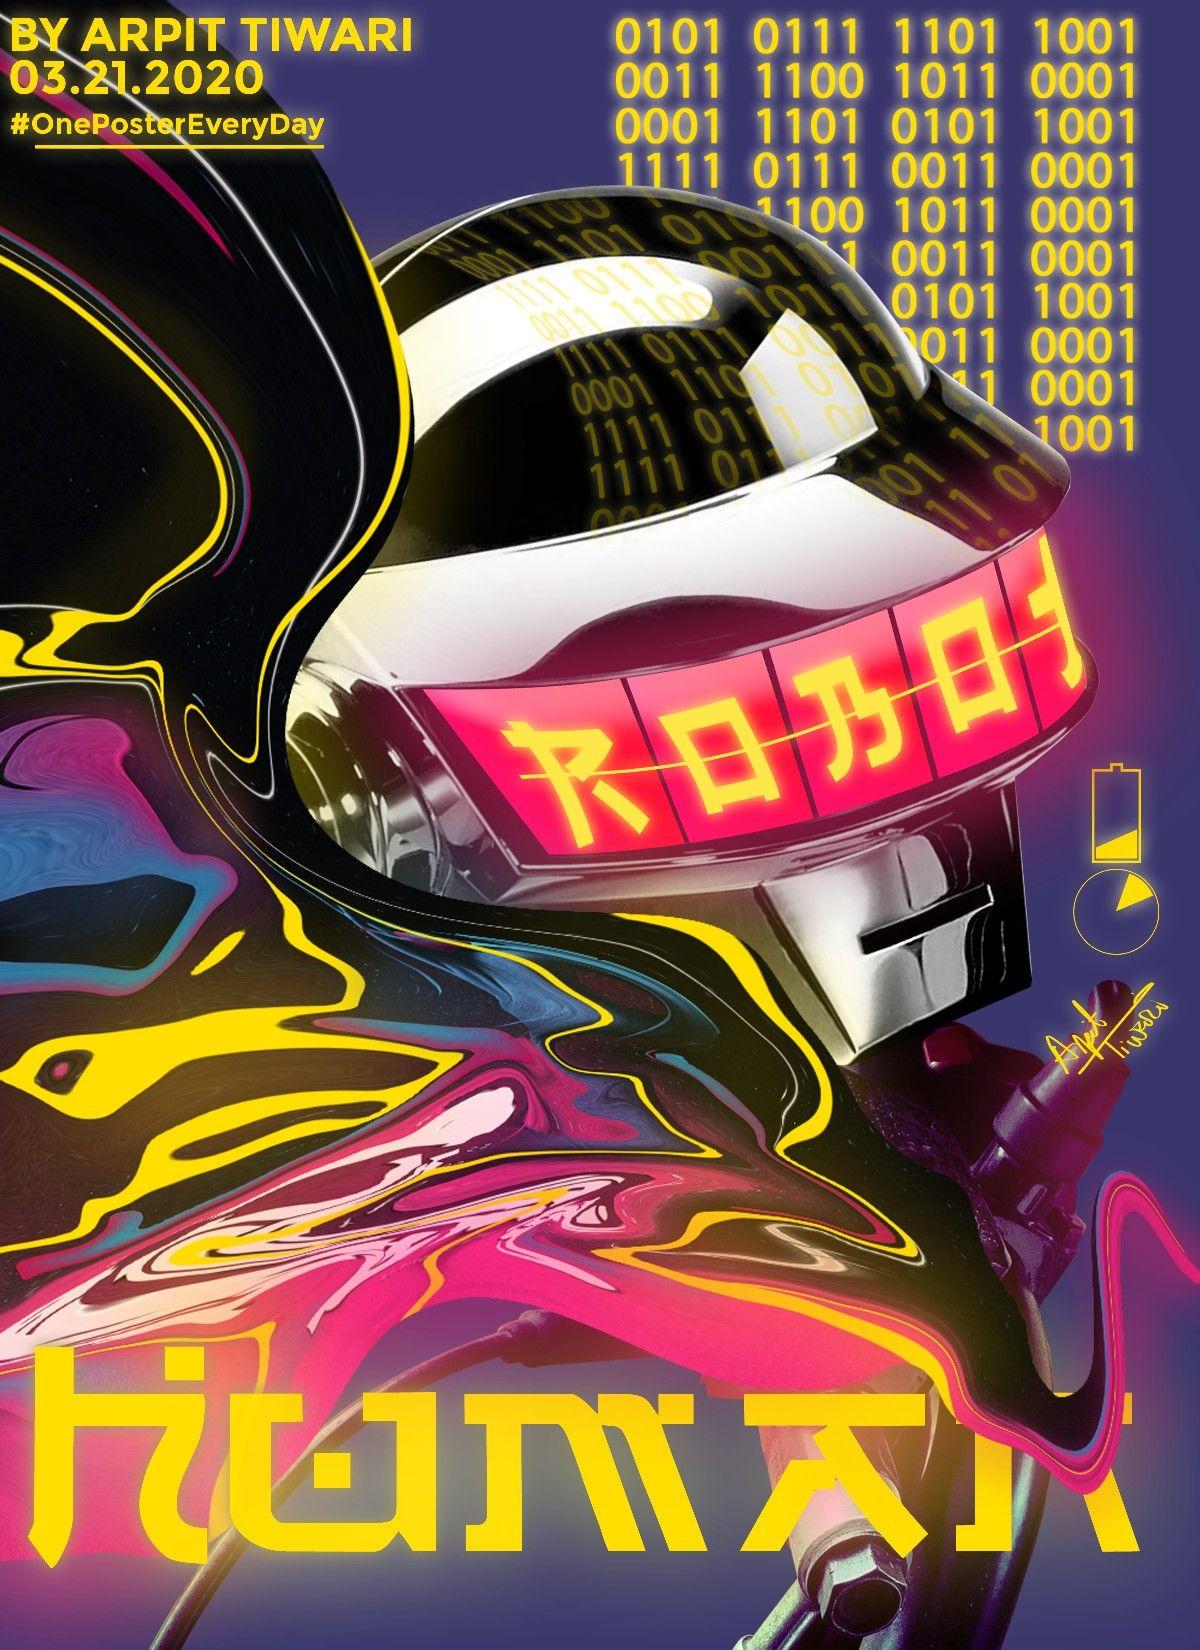 Neon Cyberpunk Daft Punk in 2020 | Daft punk, Punk, Thomas bangalter